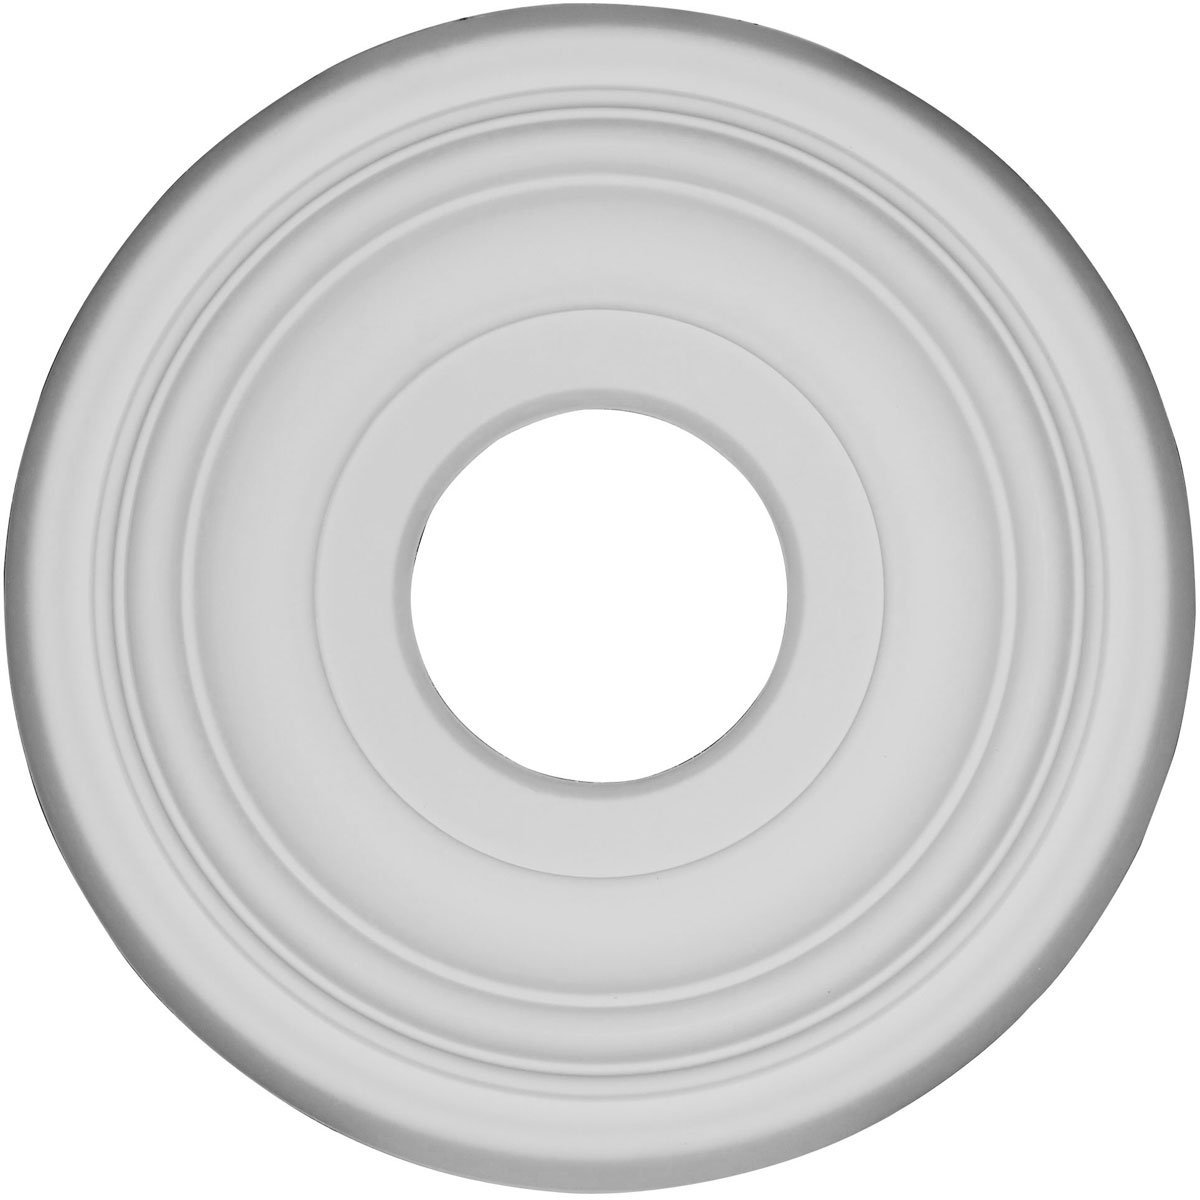 Ekena Millwork CMR12TR 11.5 x 3.5 x 1 in. Traditional Ceiling Medallion Primed